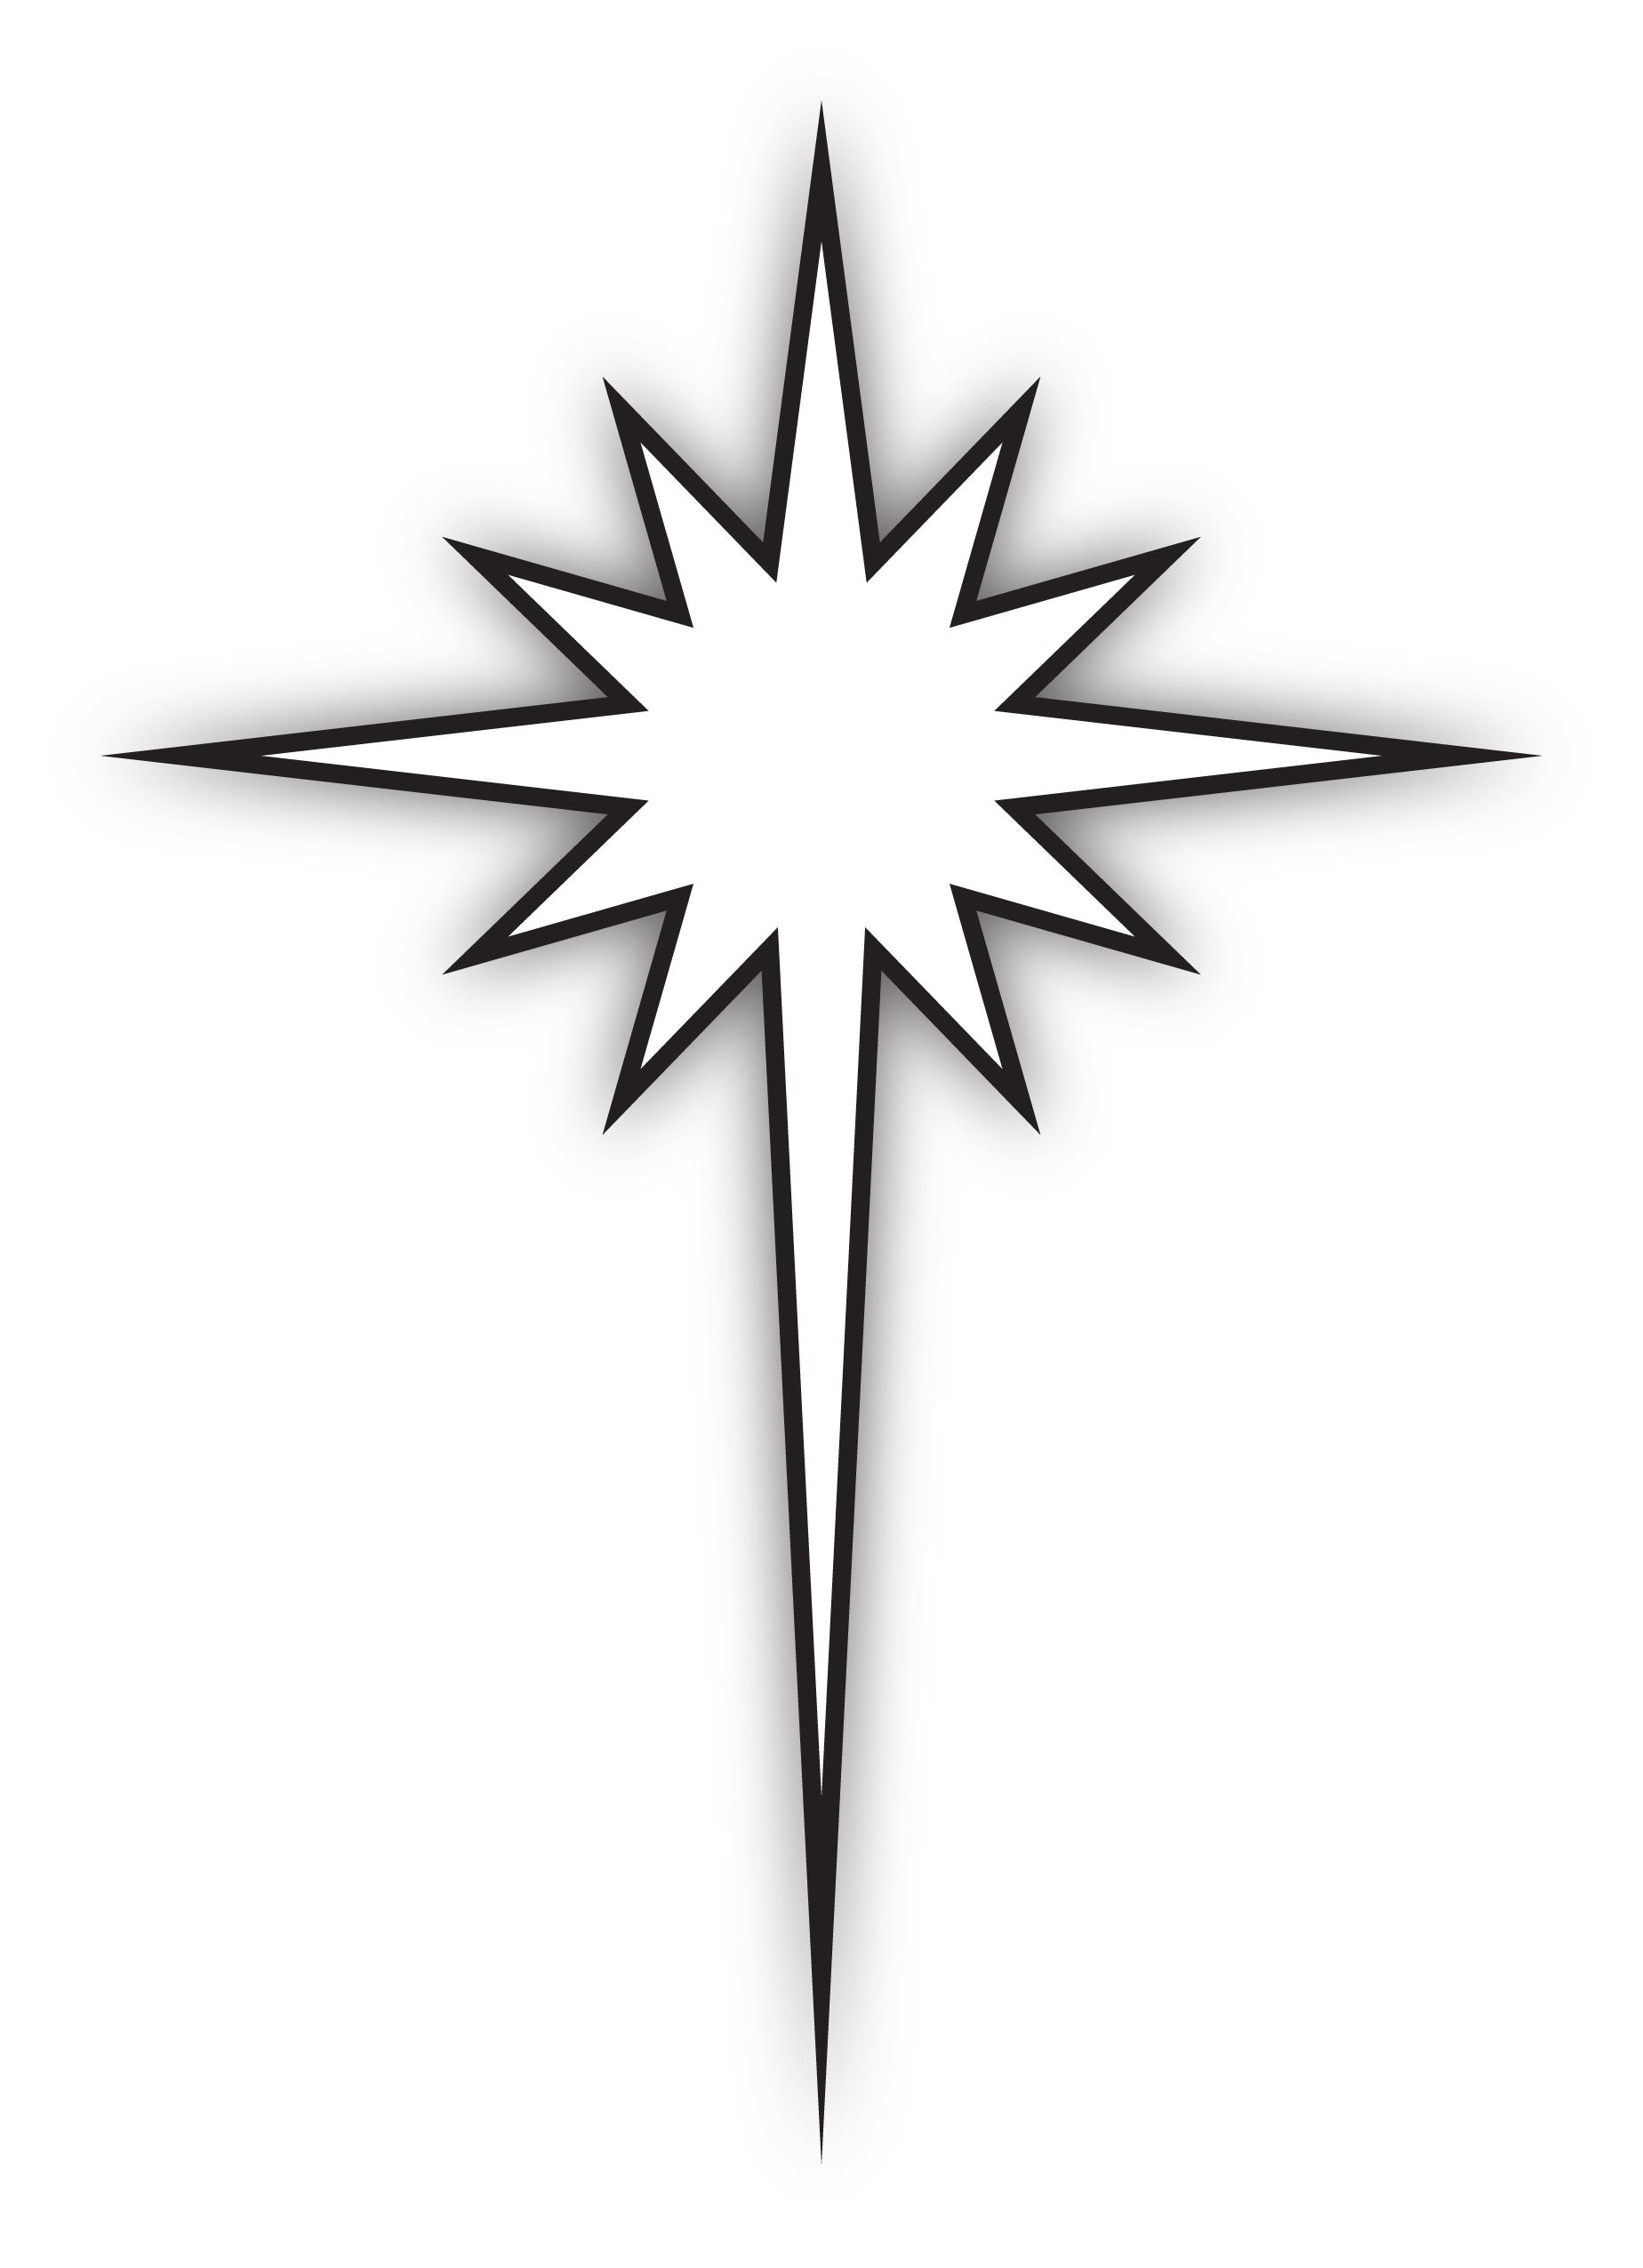 North Star Clip Art - ClipArt Best (1848 x 2551 Pixel)